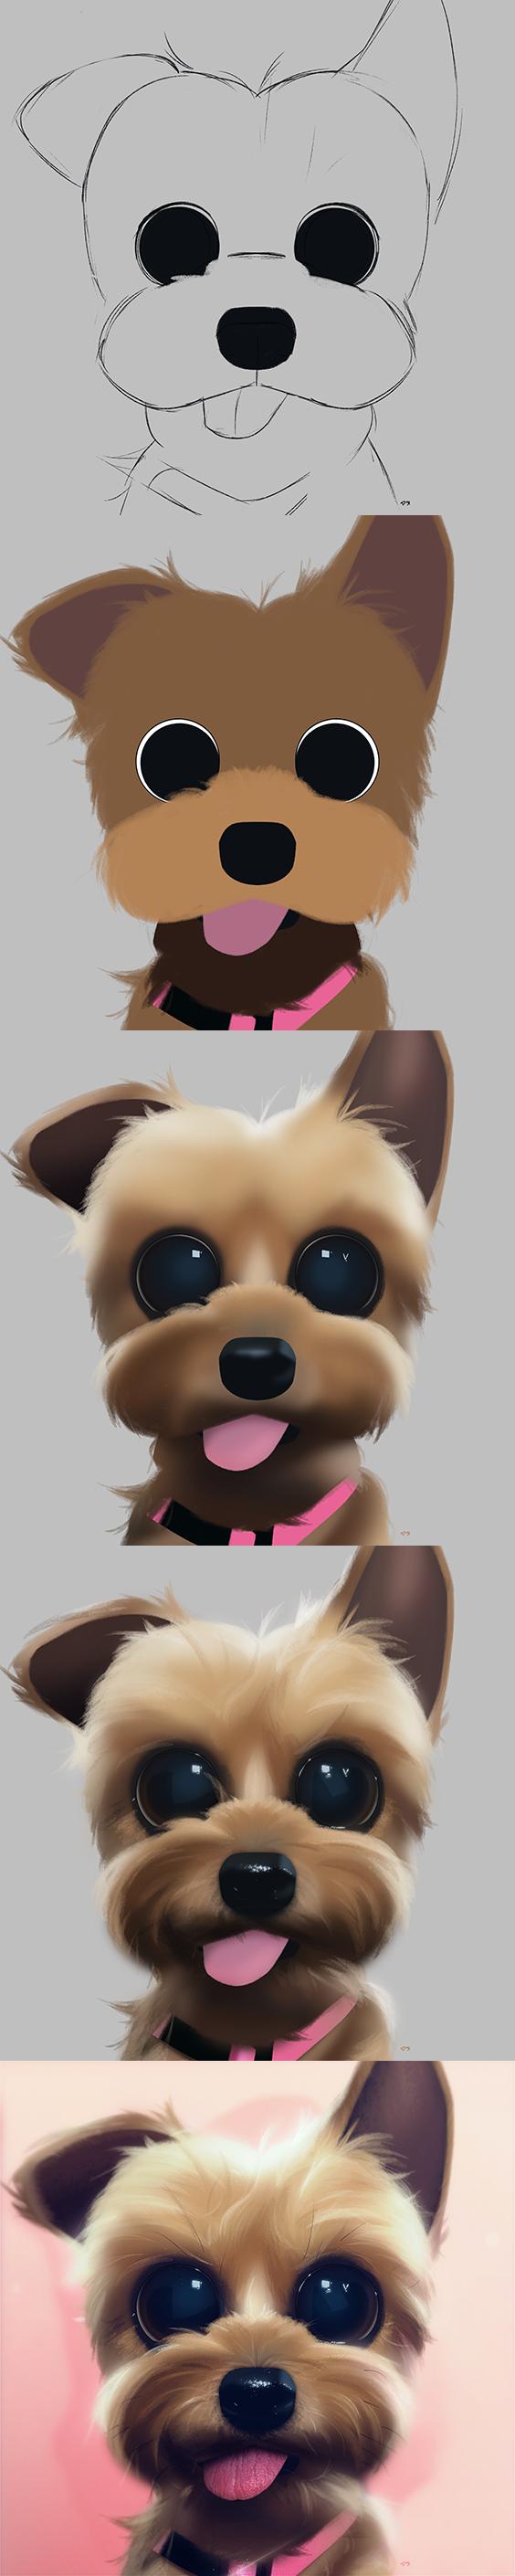 Cartoon Dog Eyes : cartoon, Cartoon,, Portrait,, Digital, Drawing,, Painting,, Character, Design,, Eyes,, Cute,, Illustra…, Design